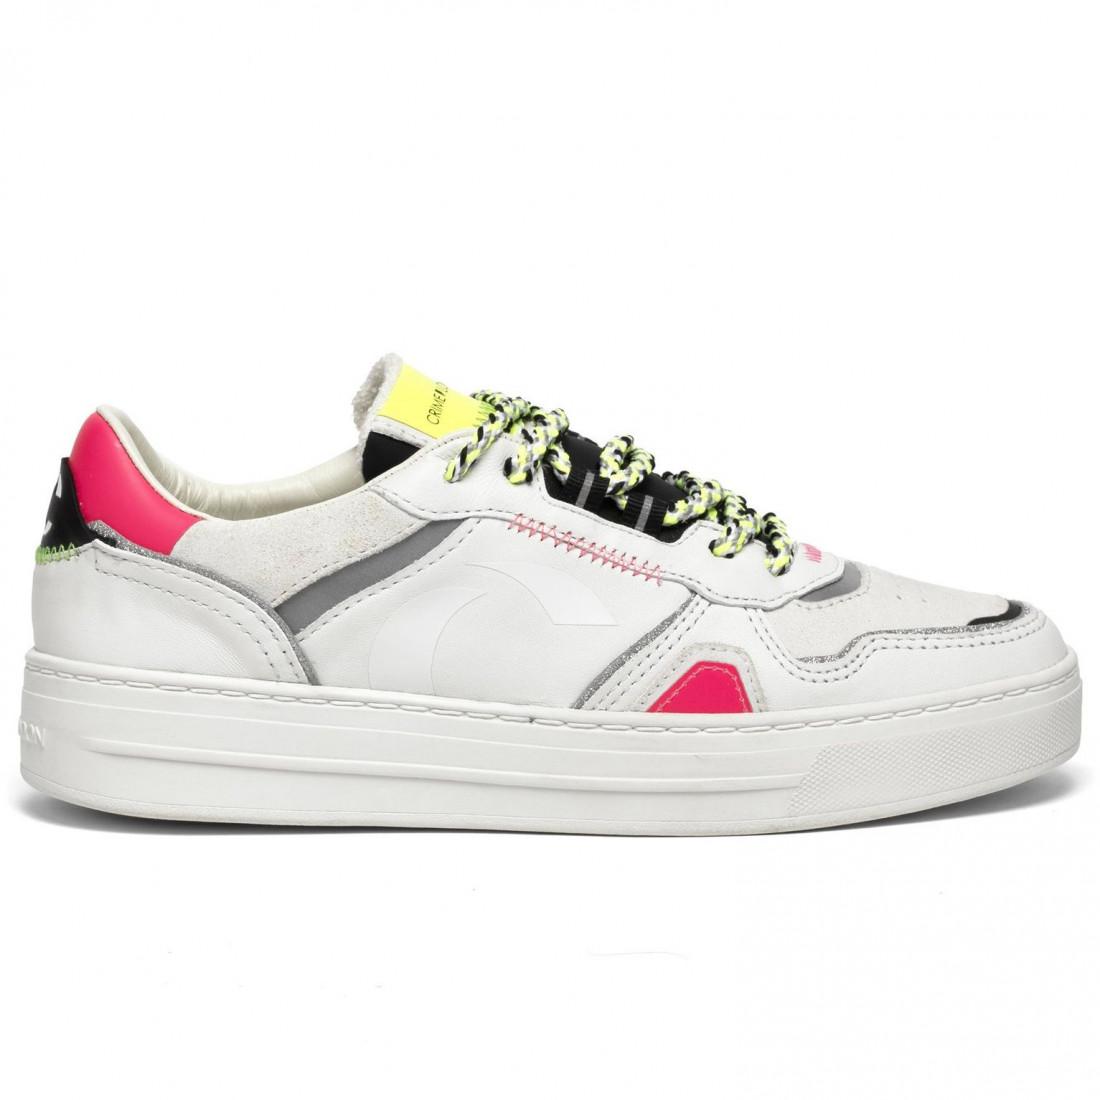 sneakers donna crime london 2500210 bianco fuxia 8441